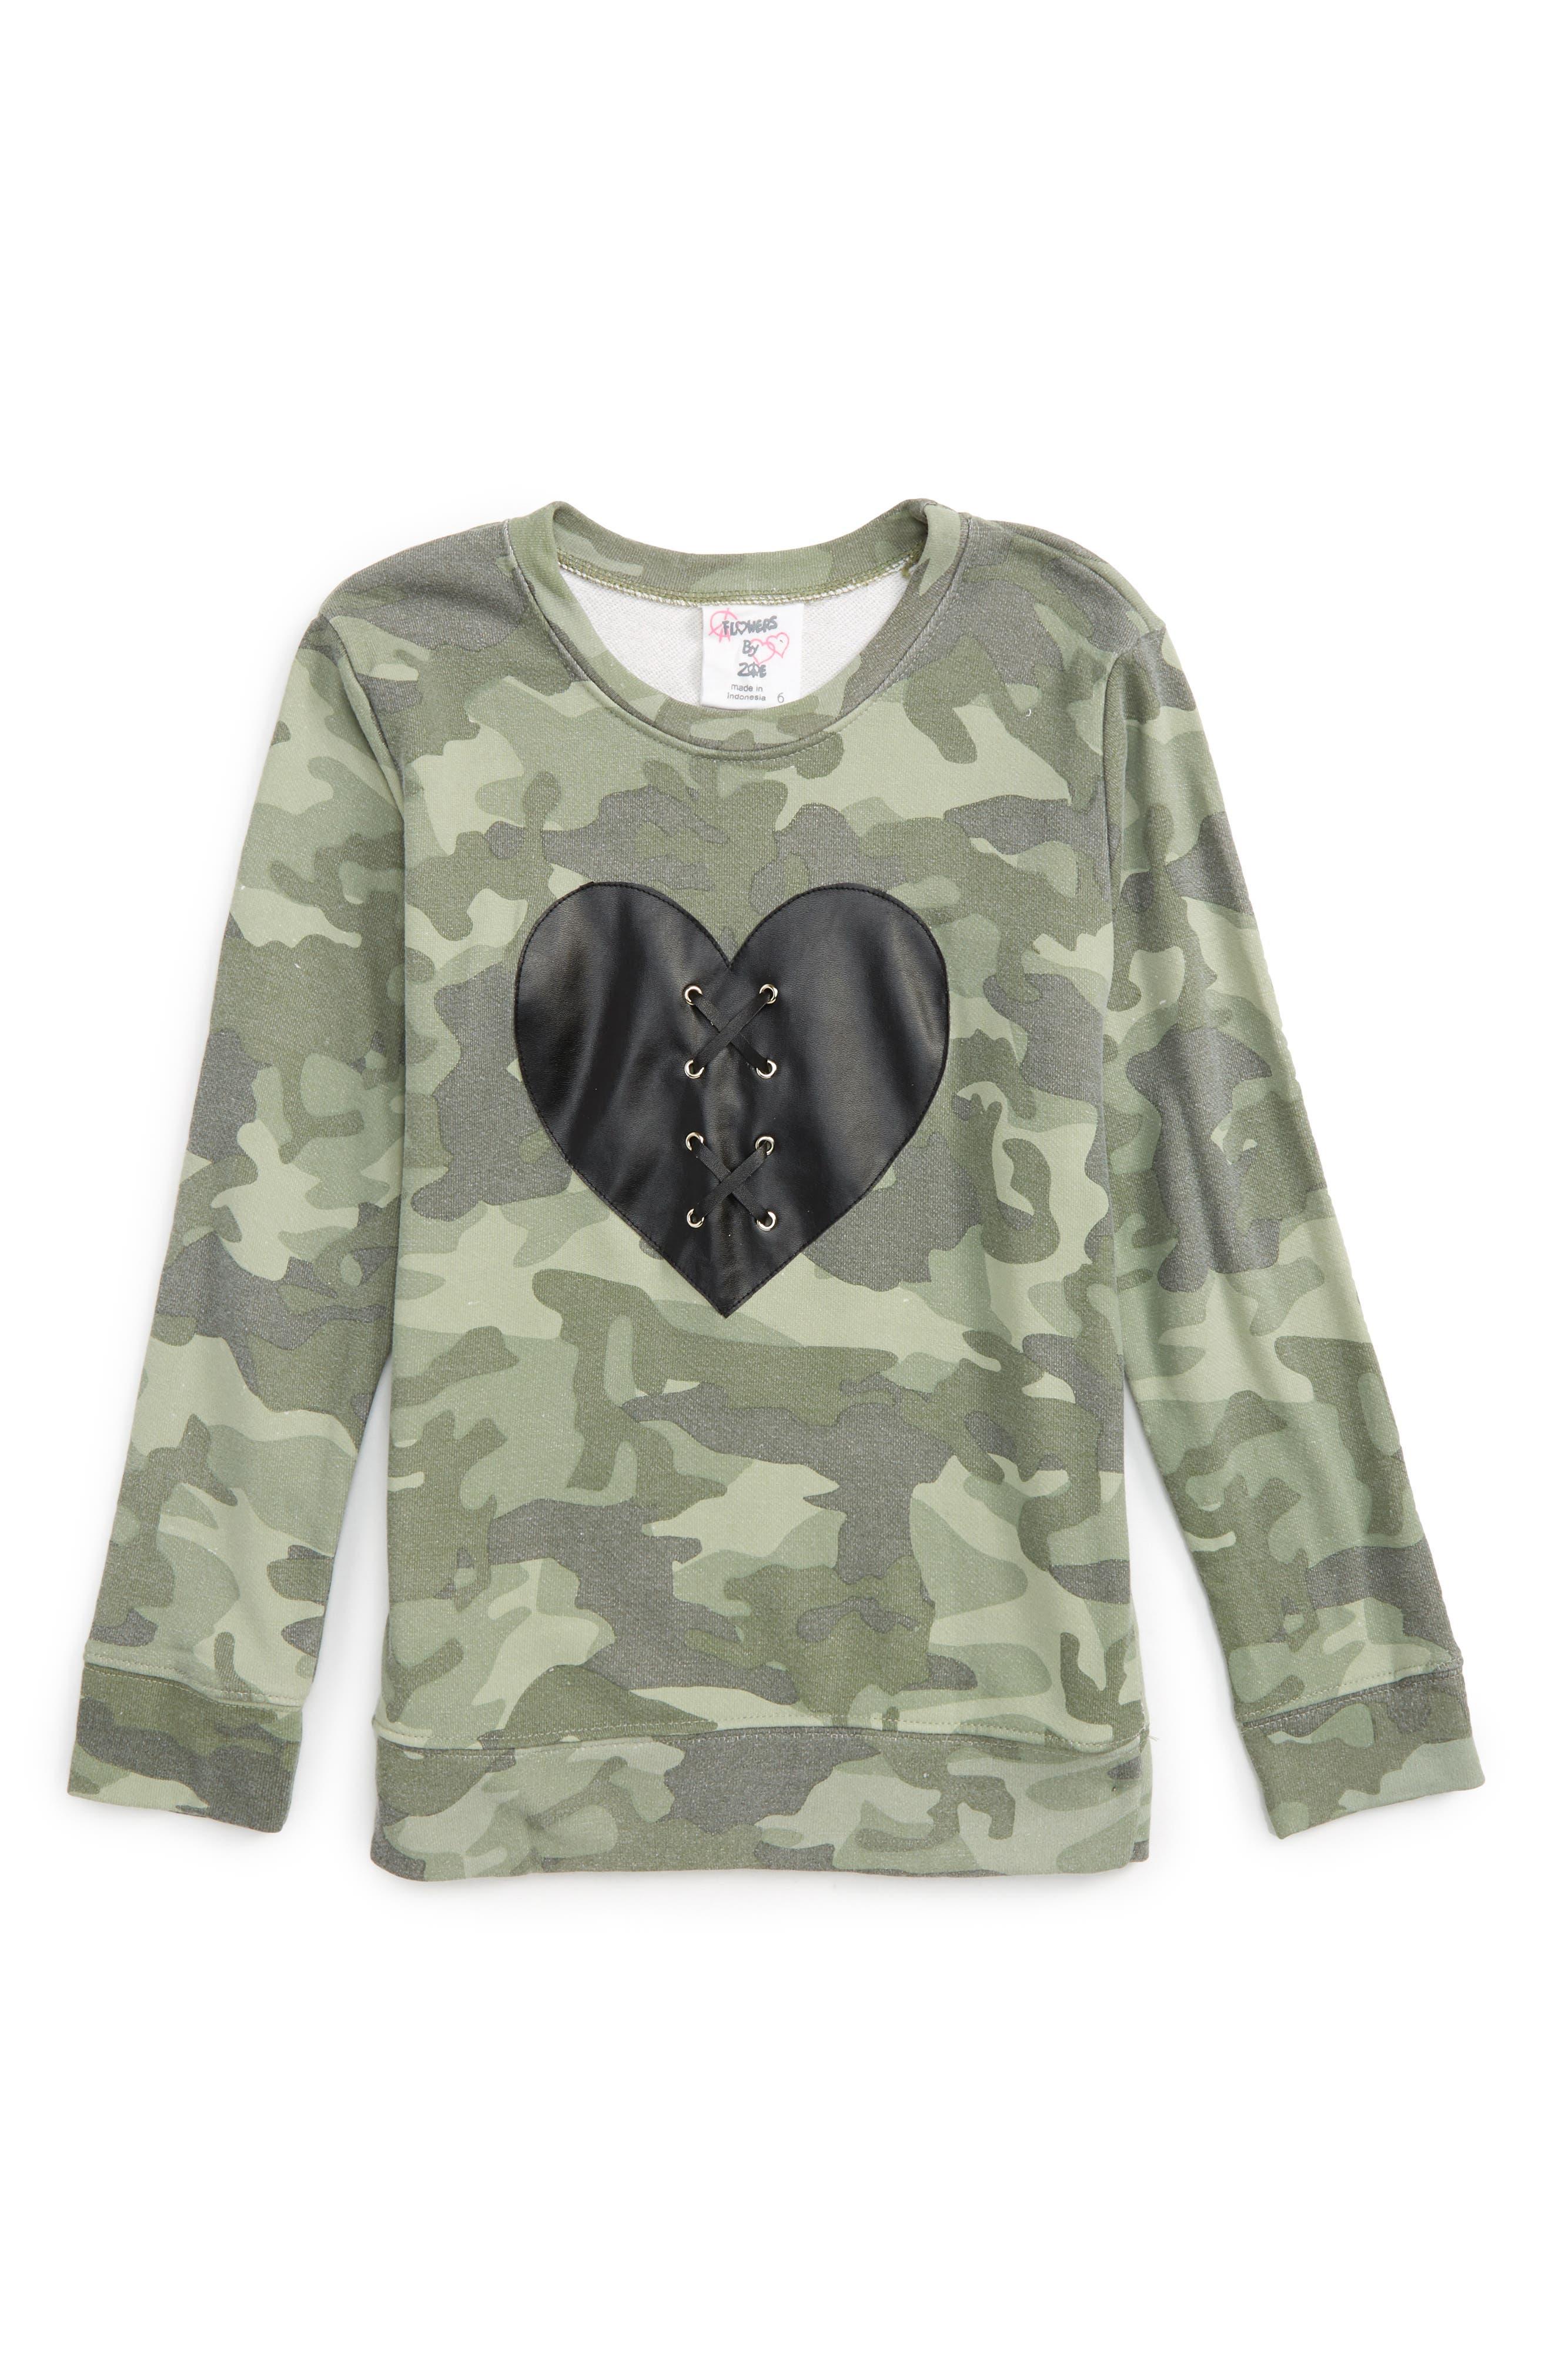 Alternate Image 1 Selected - Flowers by Zoe Lace-Up Heart Camo Sweatshirt (Little Girls & Big Girls)